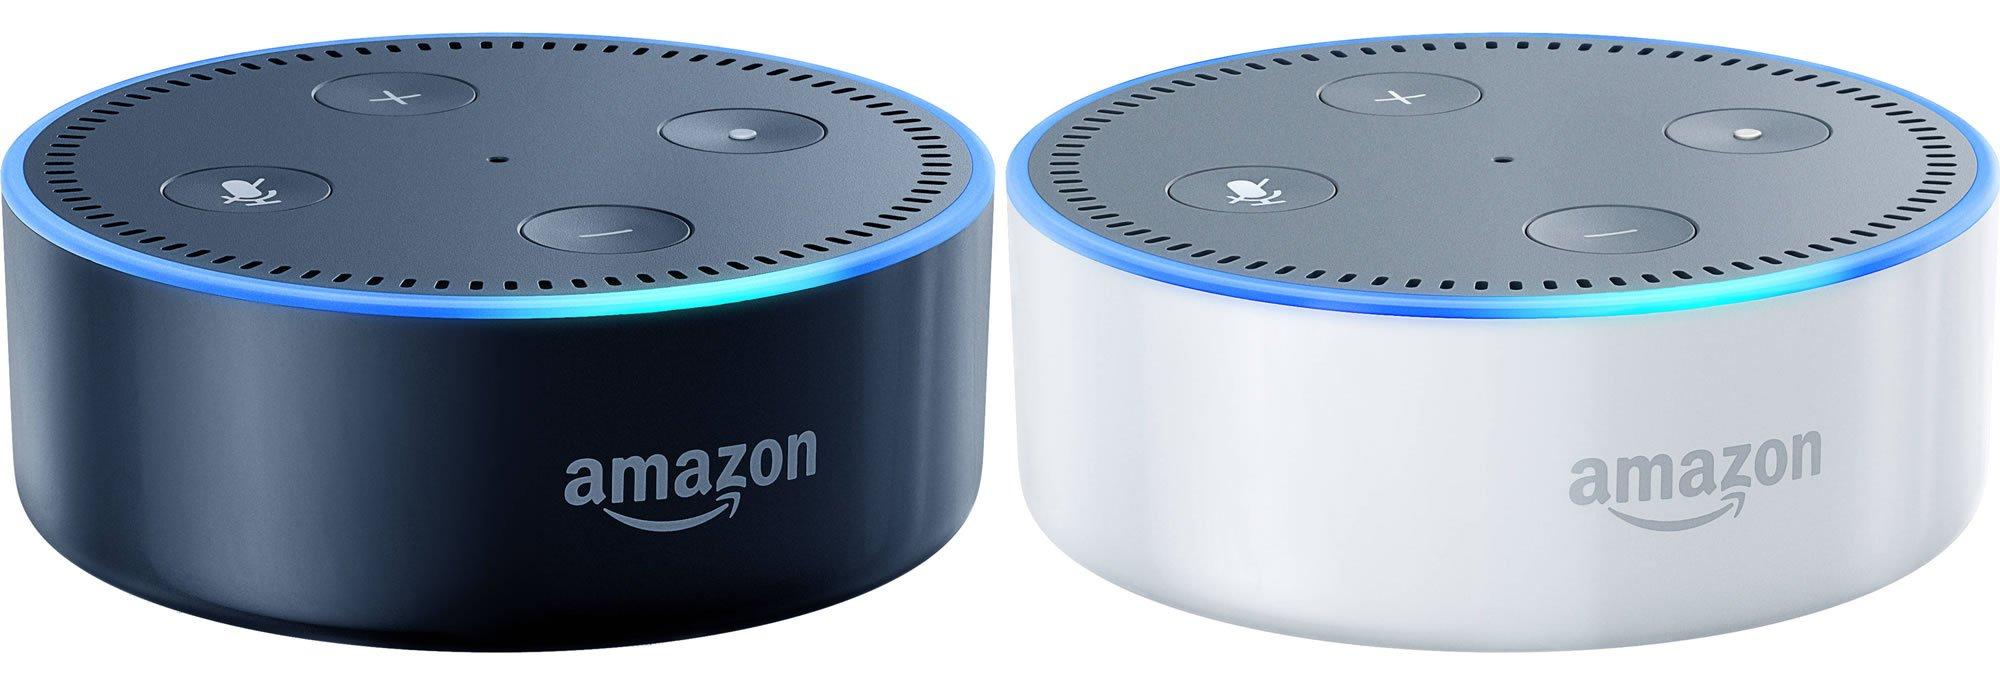 Amazon Echo Dot2 versions